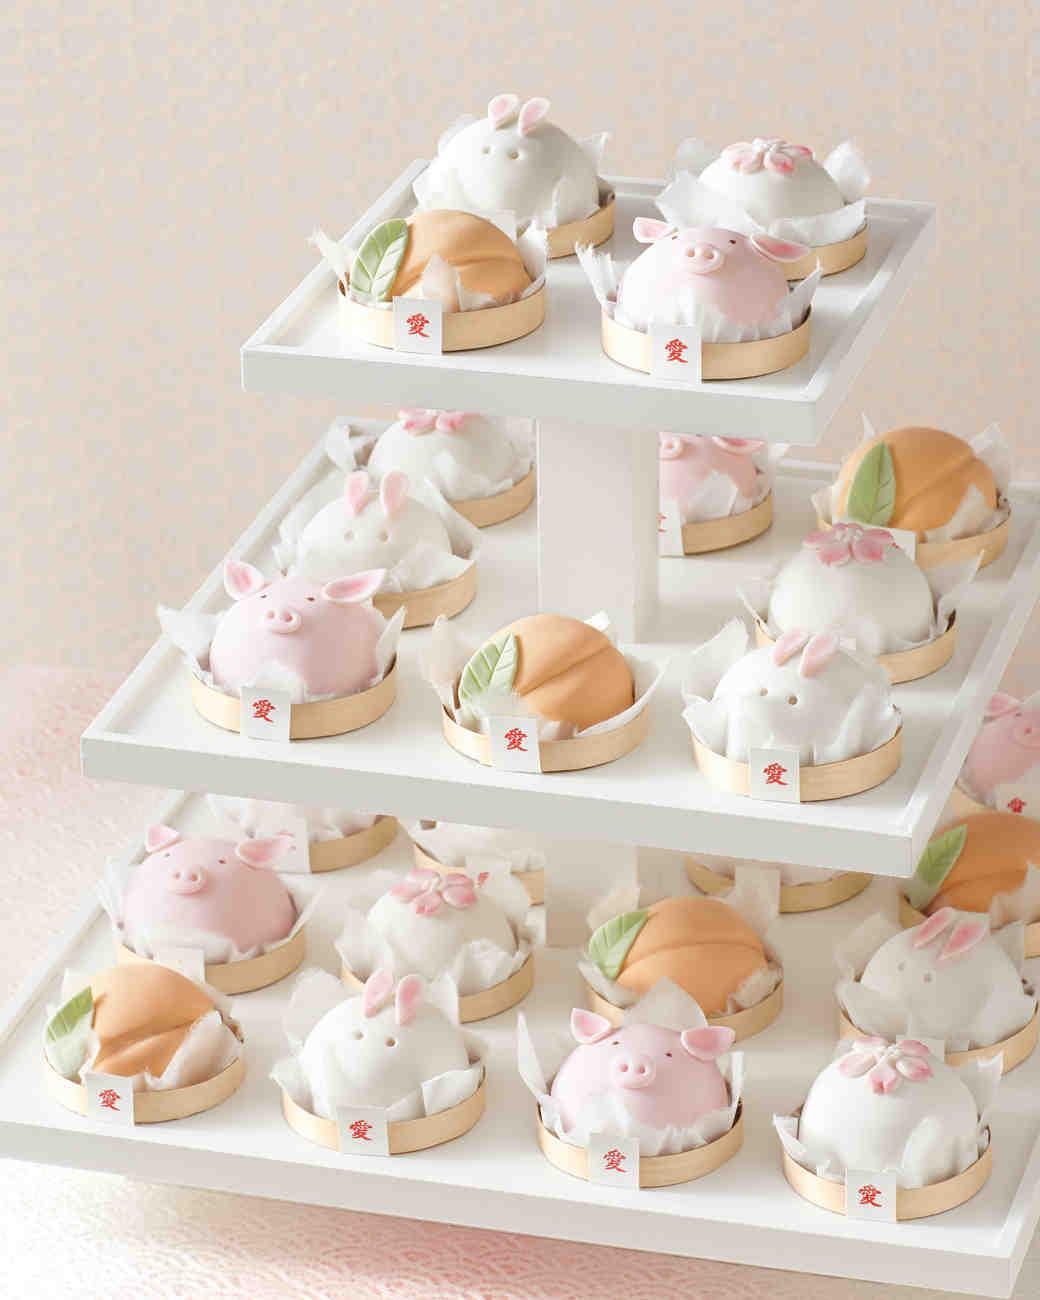 japanese-spongecake-026-mwd110426.jpg